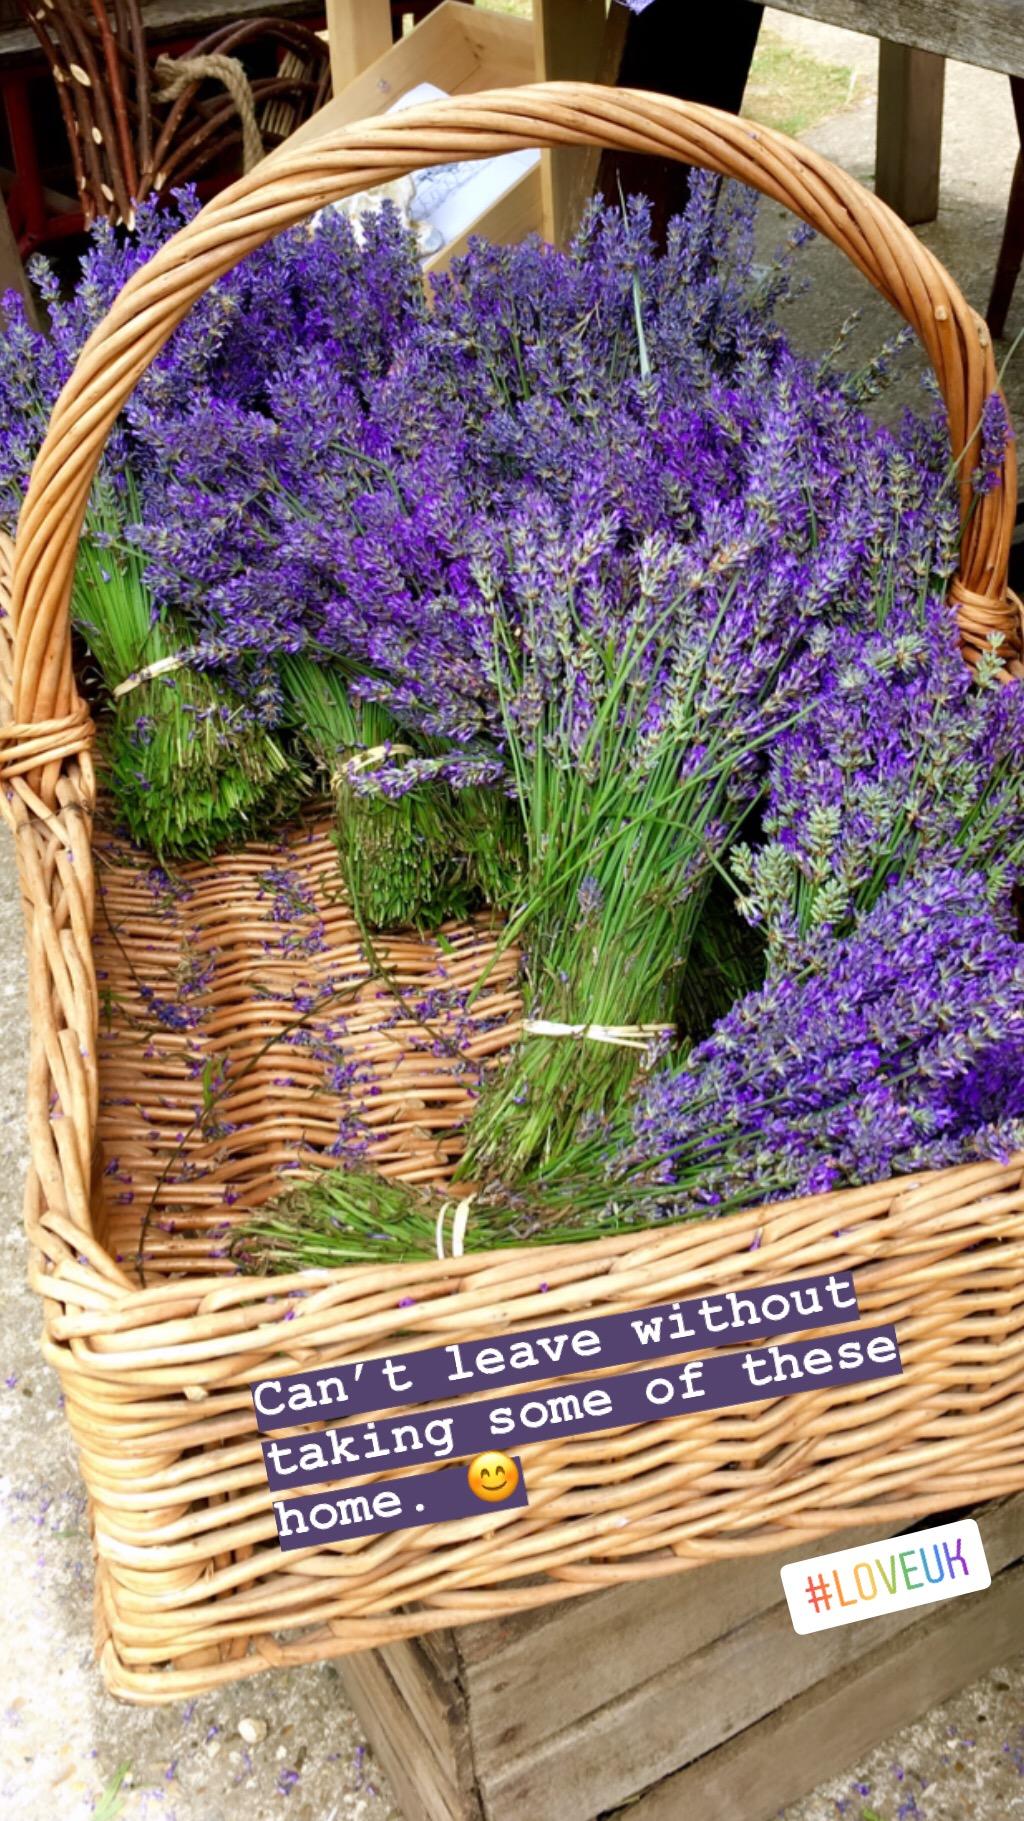 Lavender Hop Shop Castle Farm eileen hsieh follow that bug 11.JPG